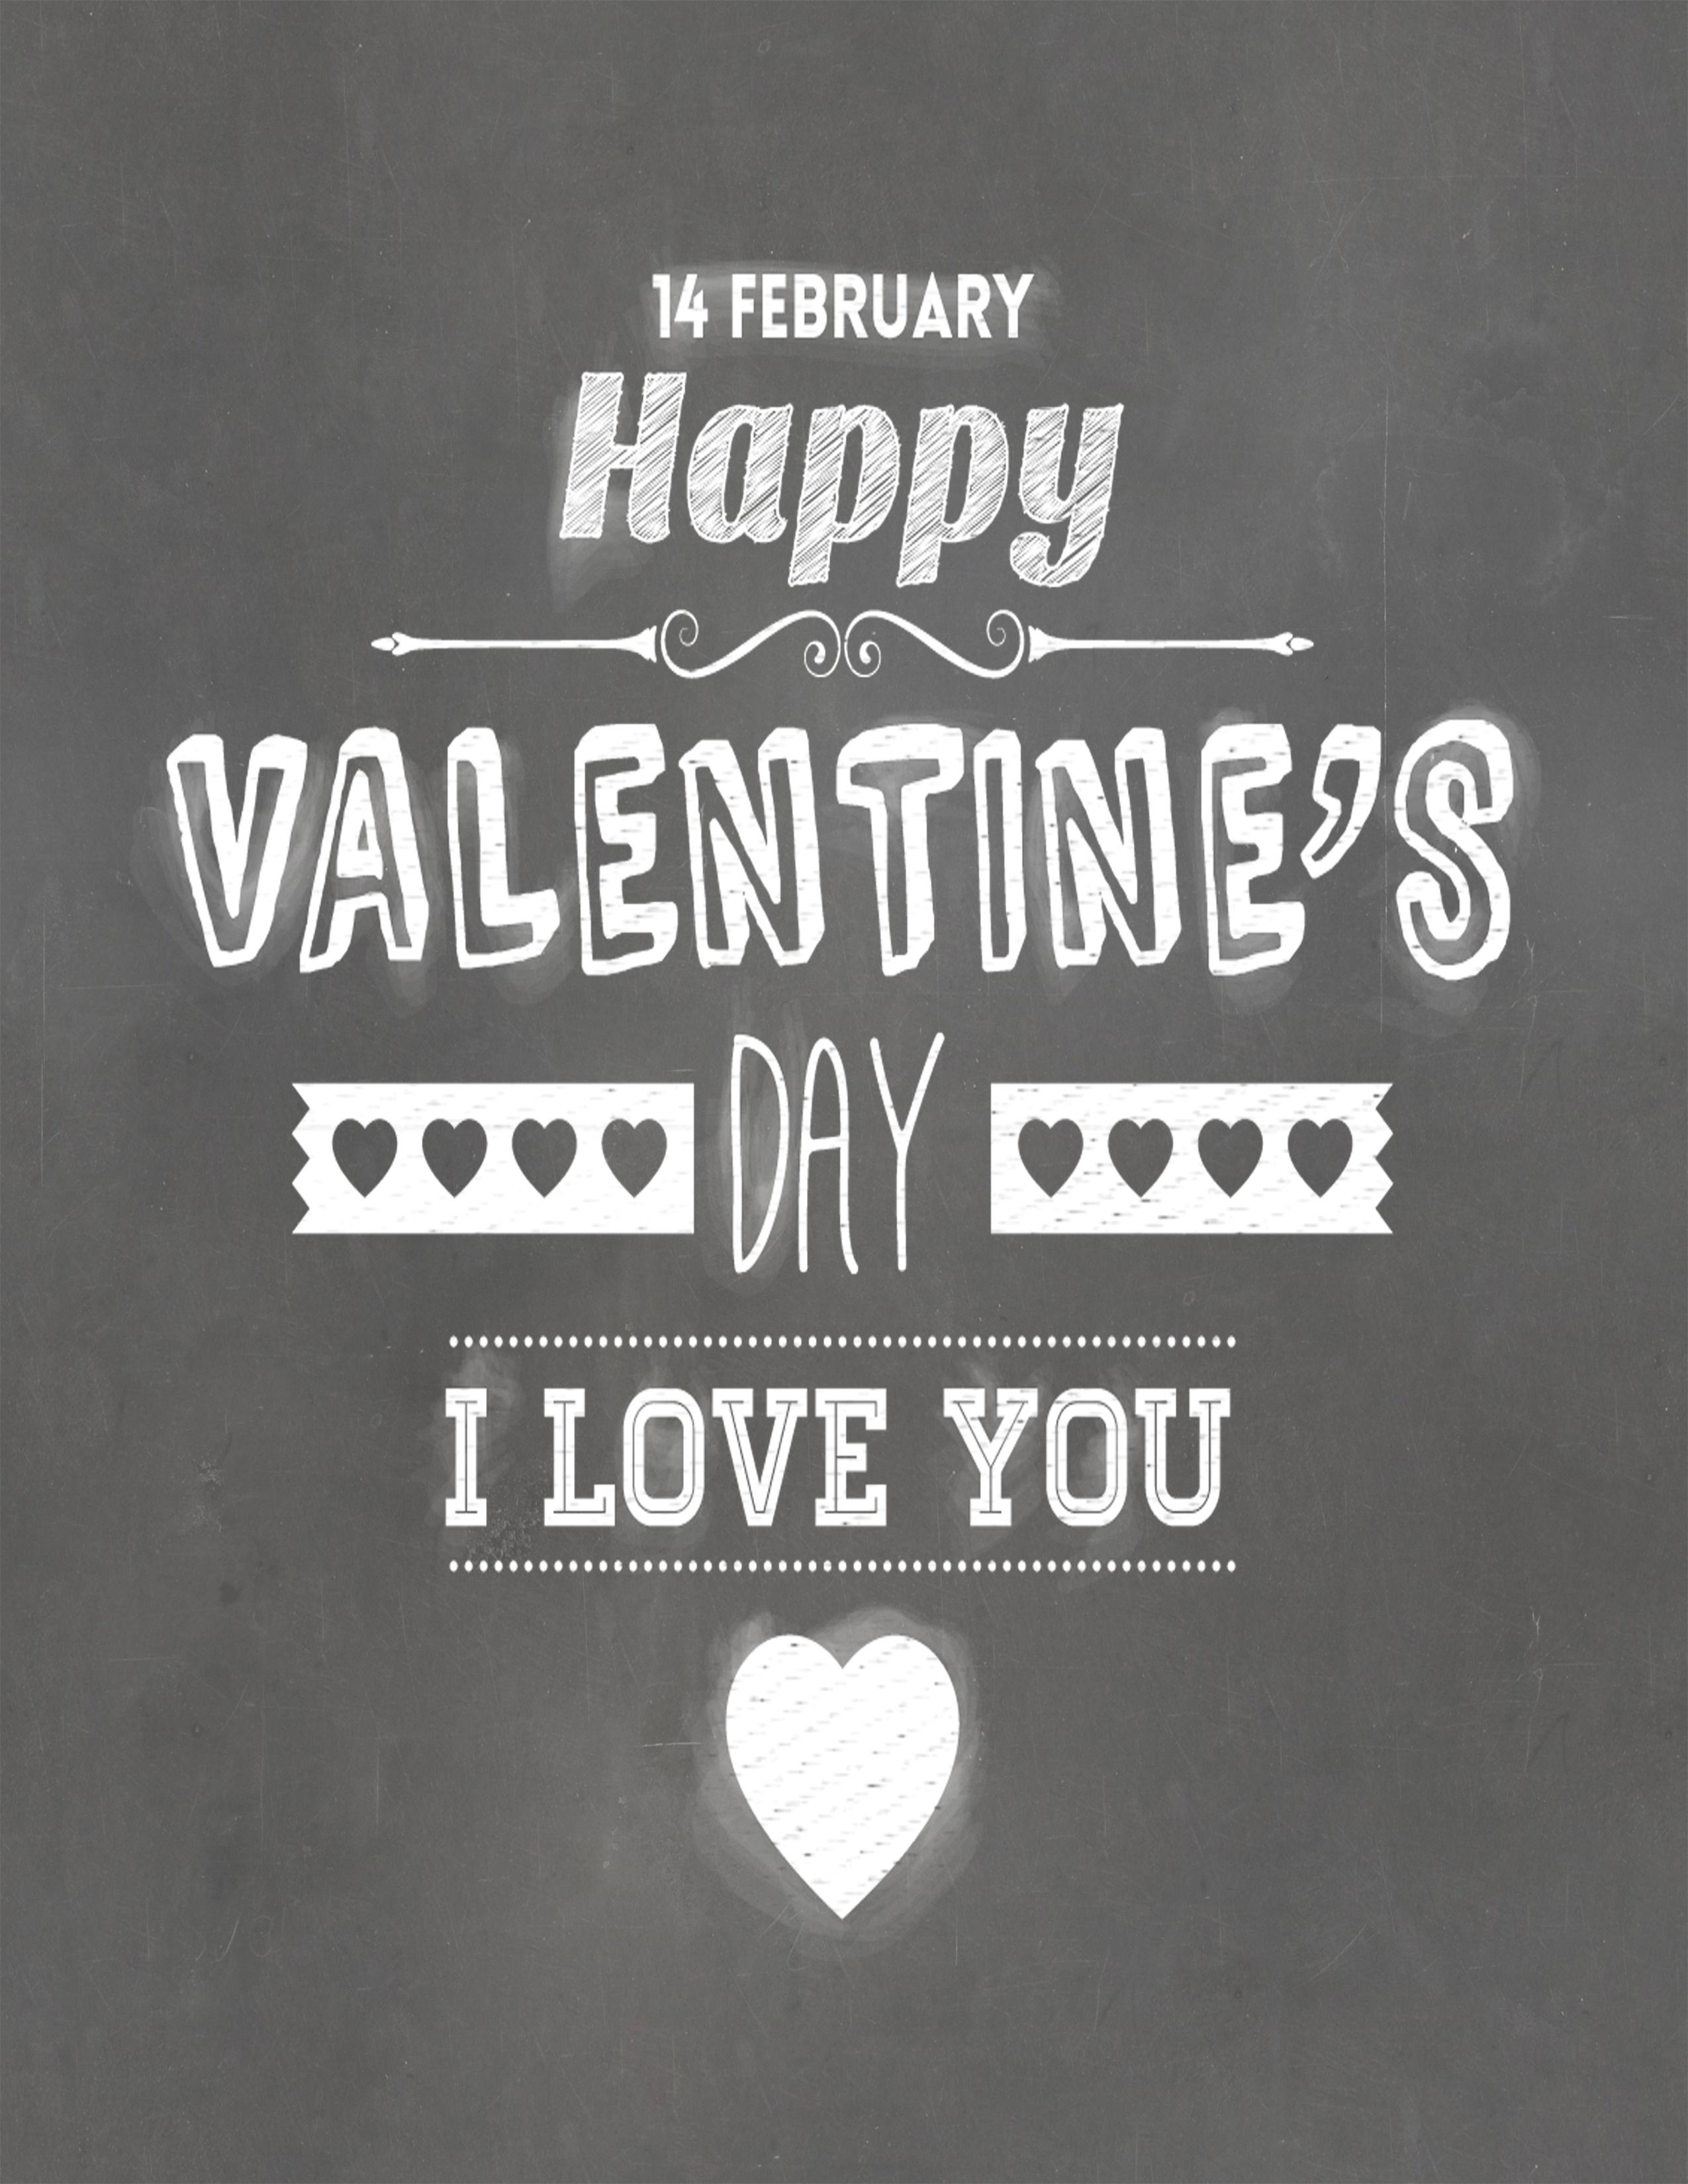 Free Printable Typography Poster - Happy Valentine's Day Chalkboard - Free Printable Typography Posters